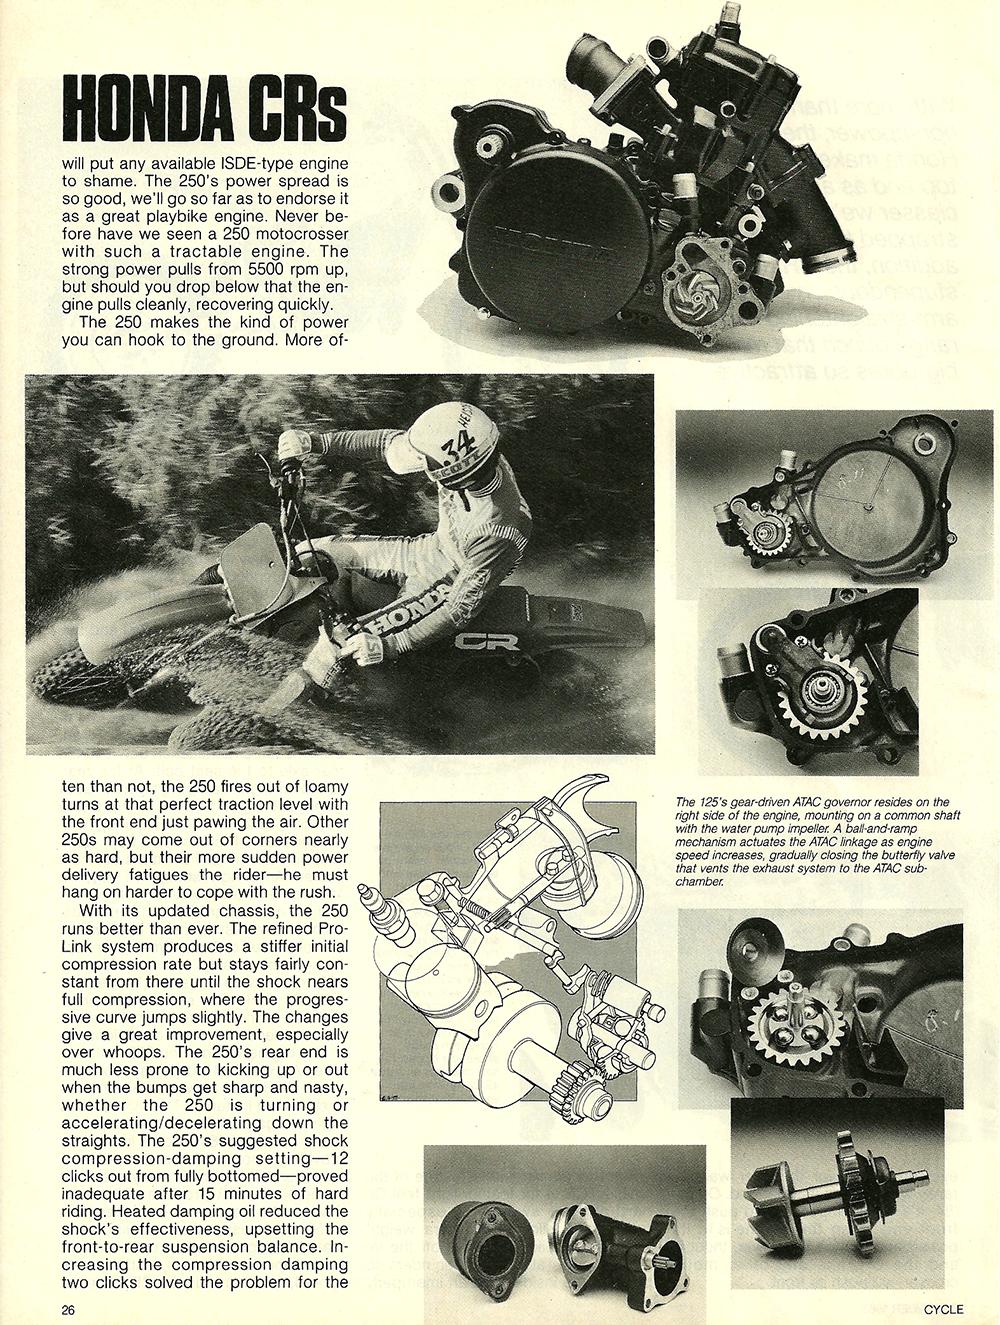 1984 Honda CR 125 250 500 road test 09.jpg